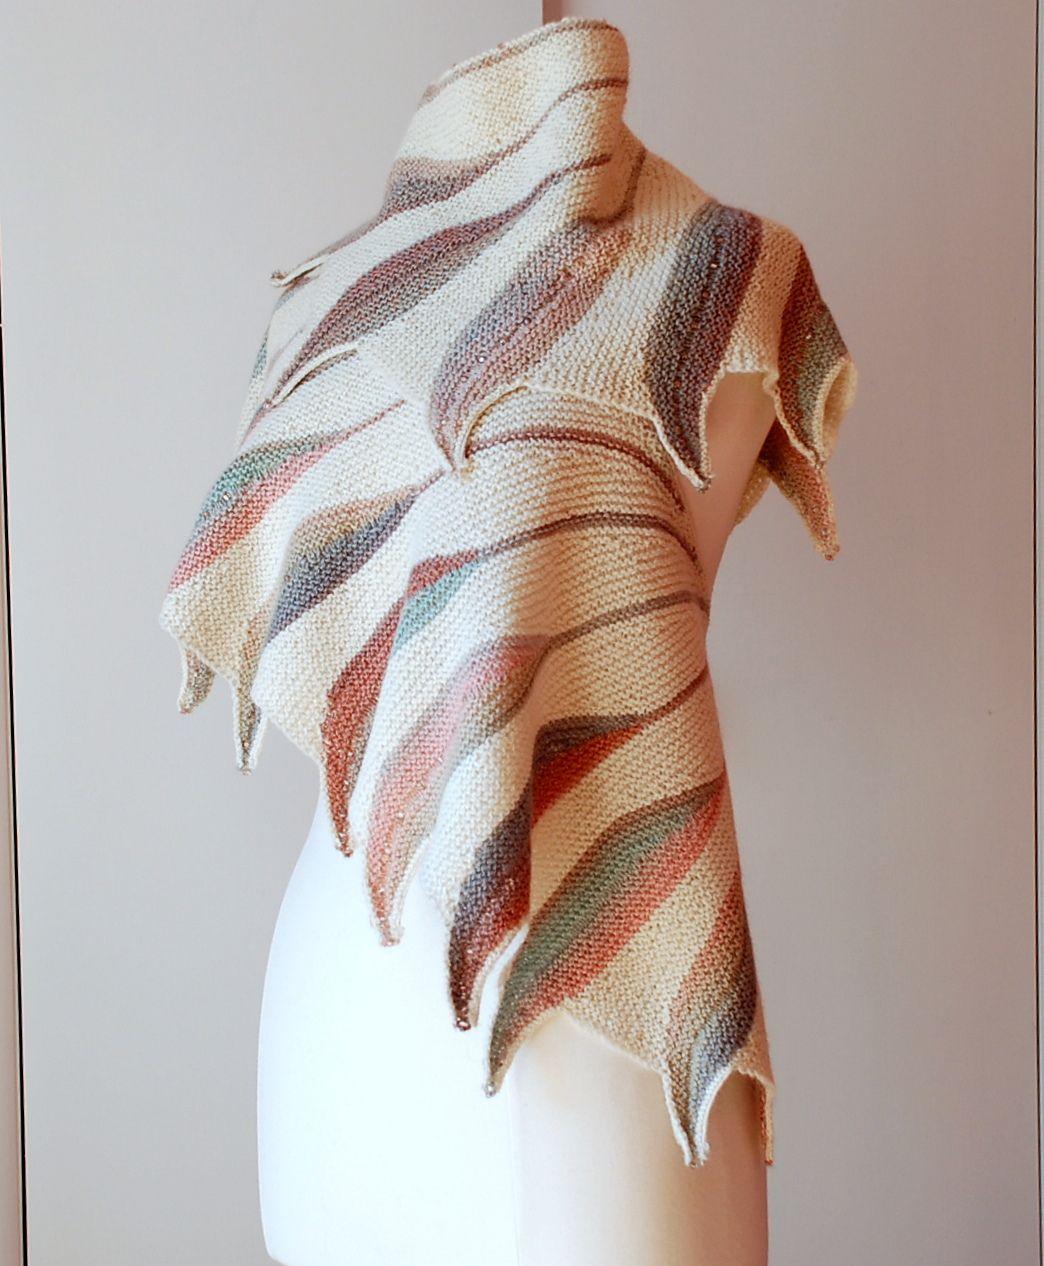 Dreambird KAL pattern by Nadita Swings | Pinterest | Chal y Puntos